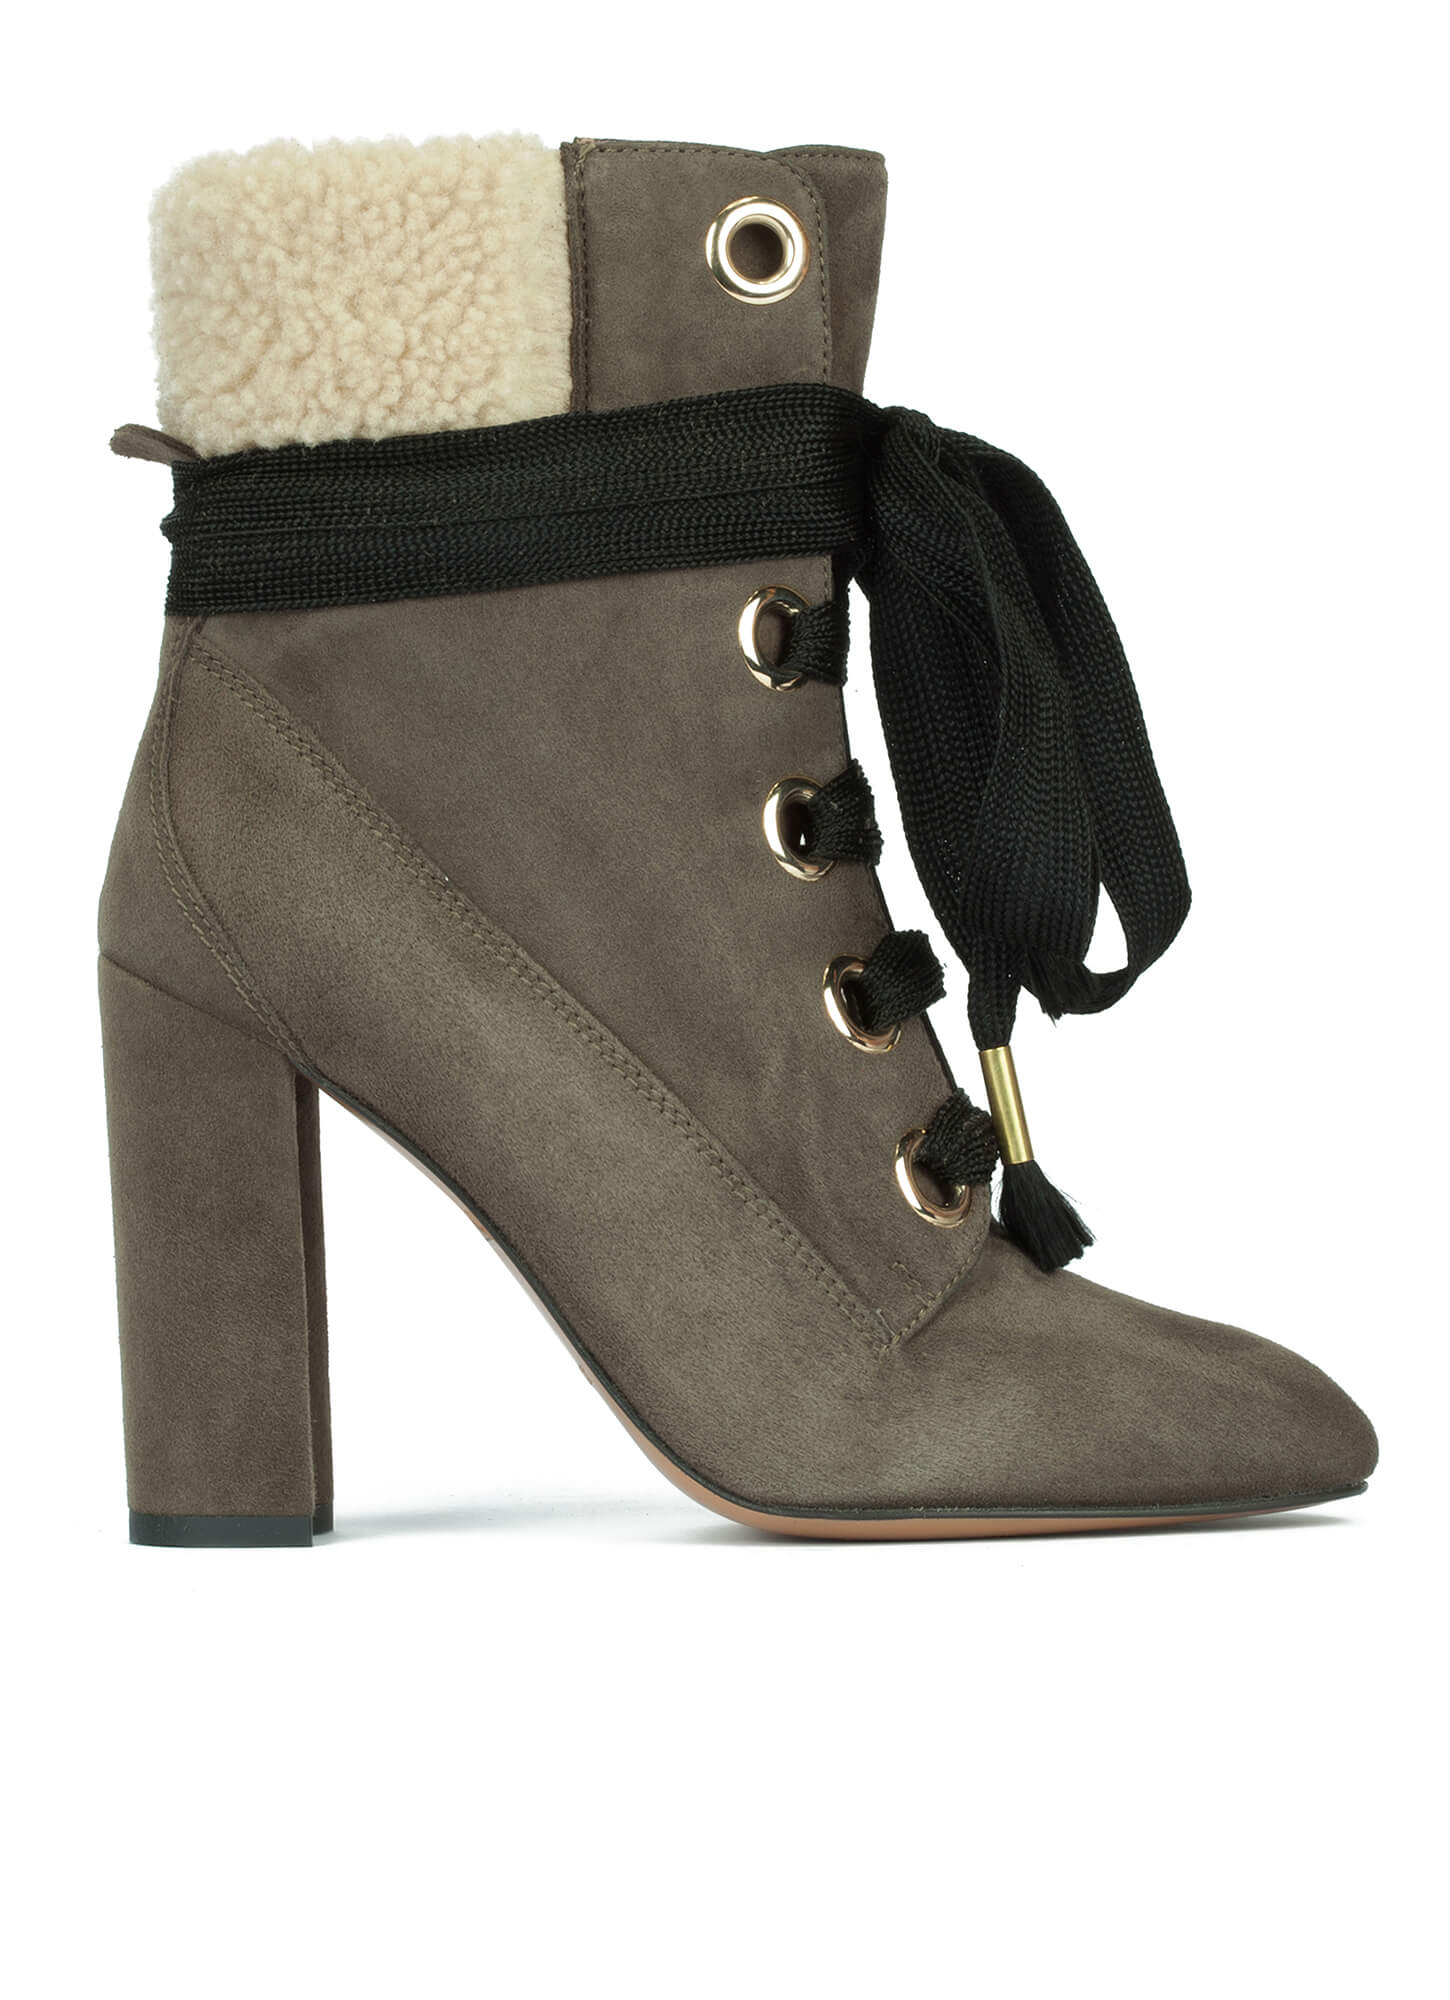 61c4184cae0 Green high heel ankle boots - online shoe store Pura Lopez . PURA LOPEZ